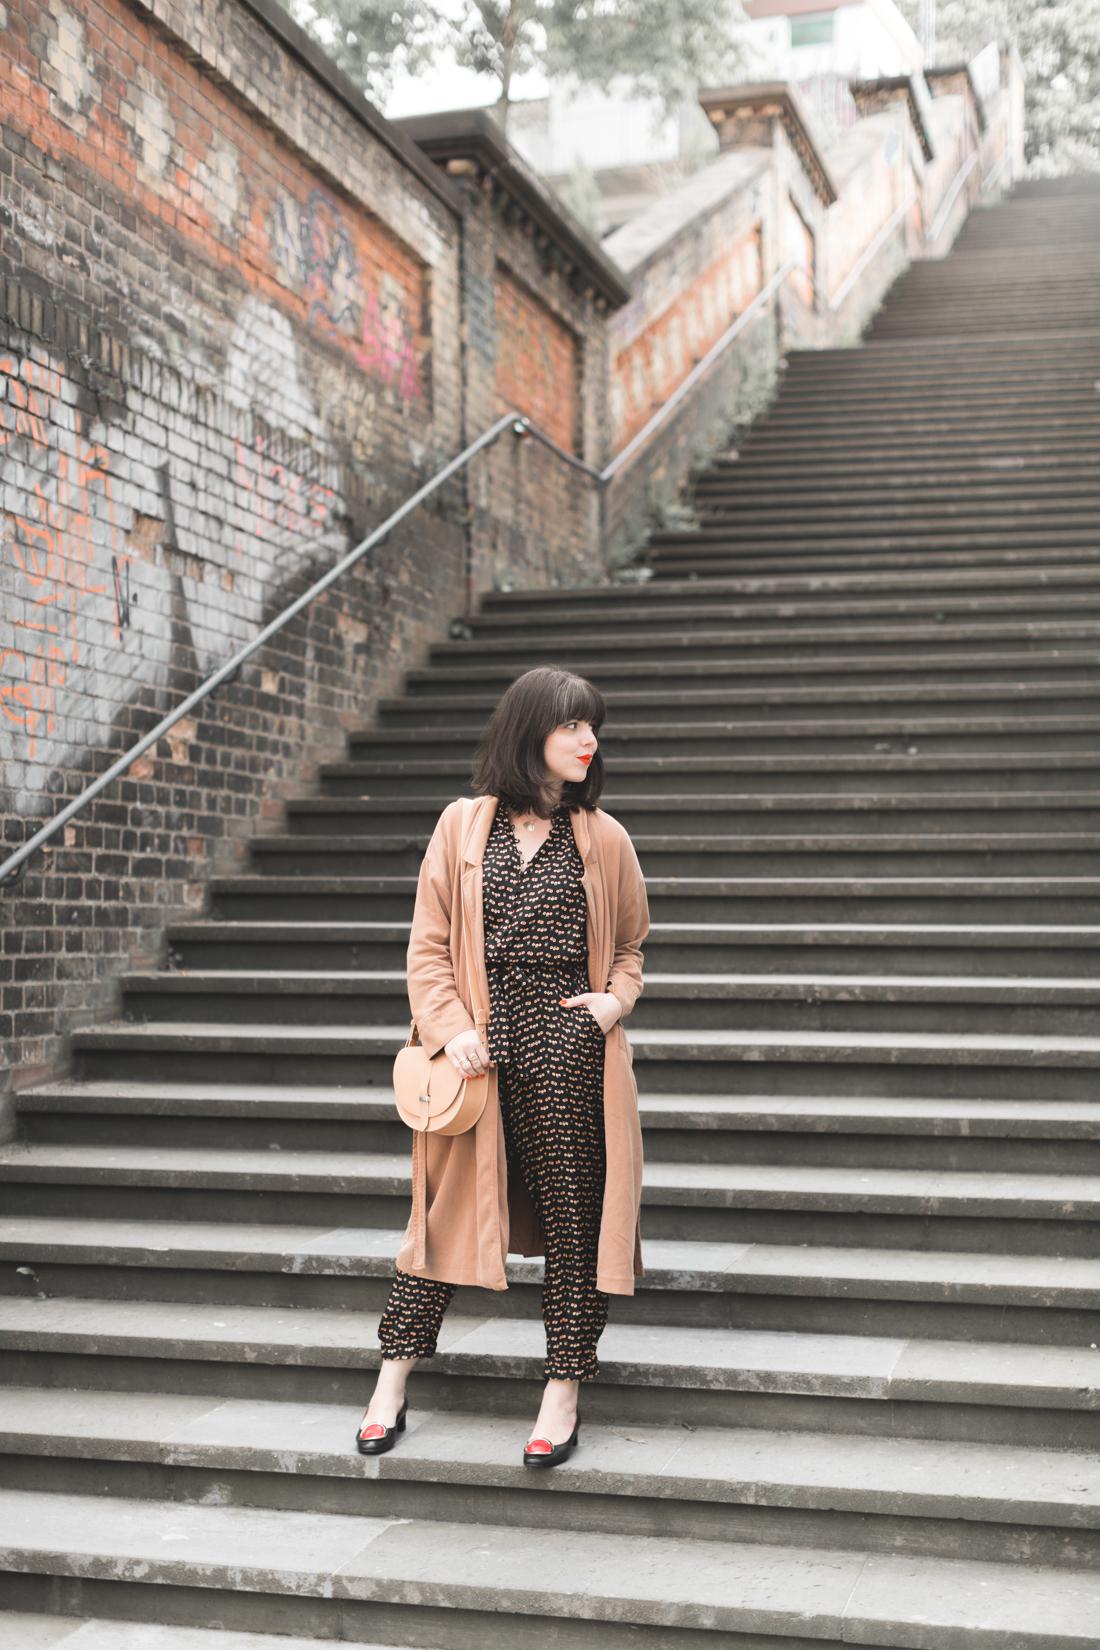 combi_sezane_sac_claude_ballerines-chaussures-exclusif-paris_Pauline_Privez_paulinefashionblog_com-4